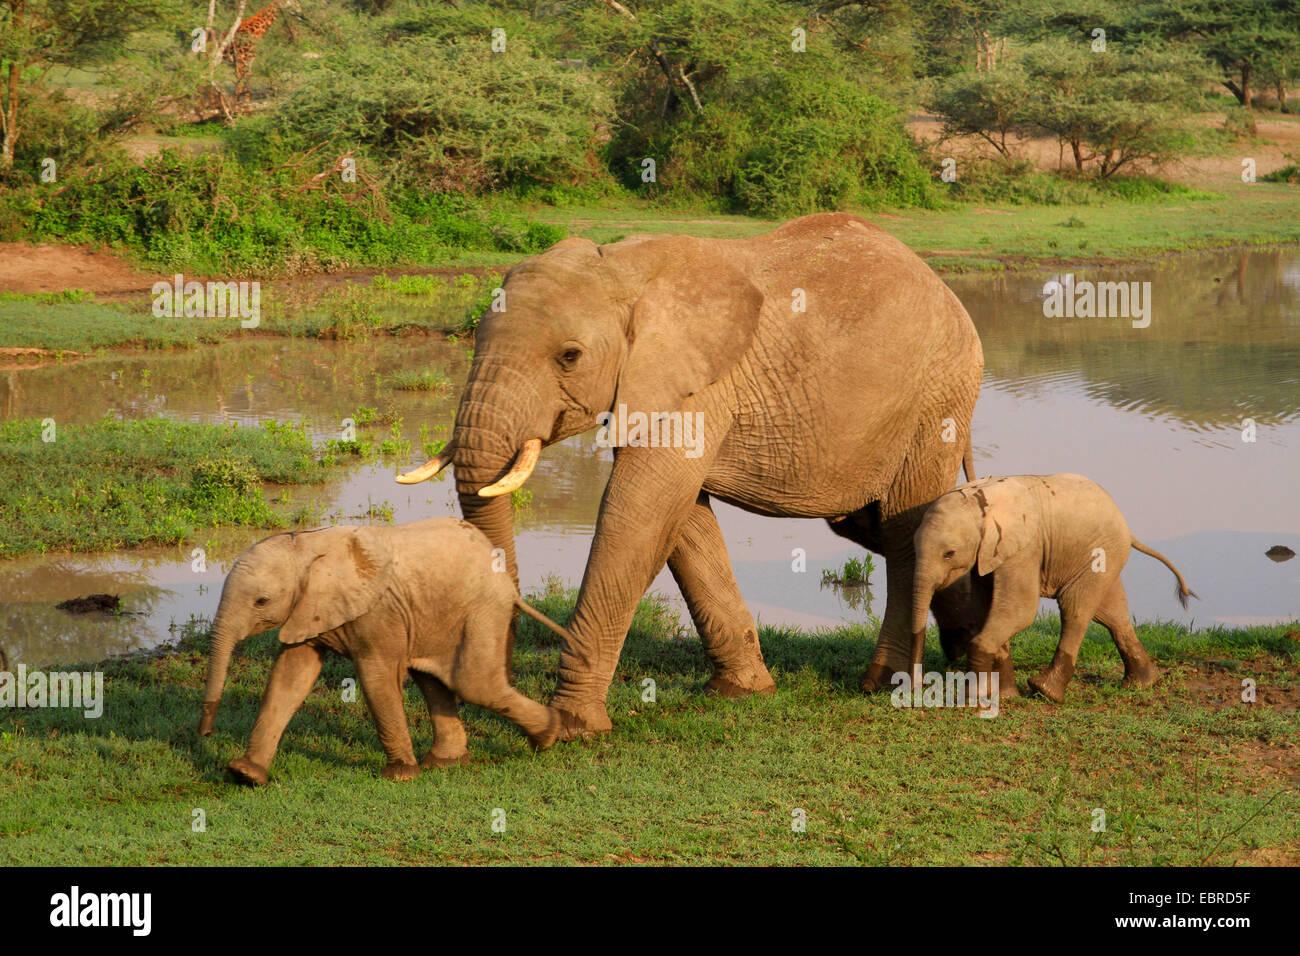 African elephant (Loxodonta africana), cow elephant with two calves at the waterhole, Tanzania, Serengeti National - Stock Image